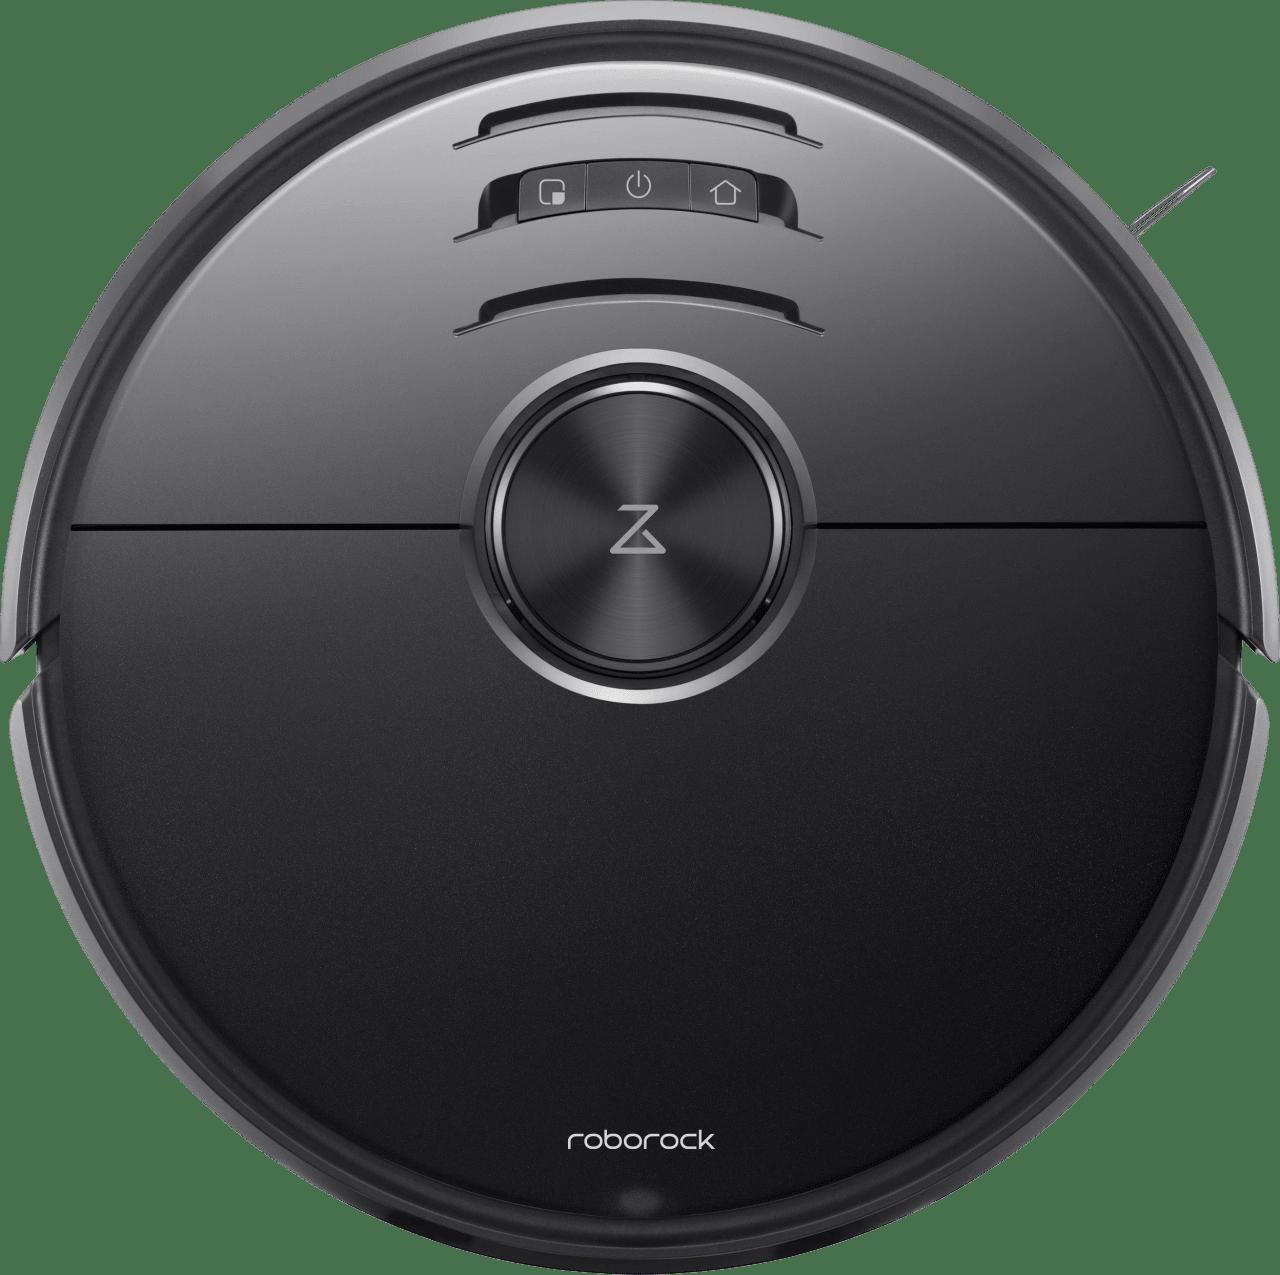 Black Roborock S6 MaxV Vacuum & Mop Robot Cleaner.1